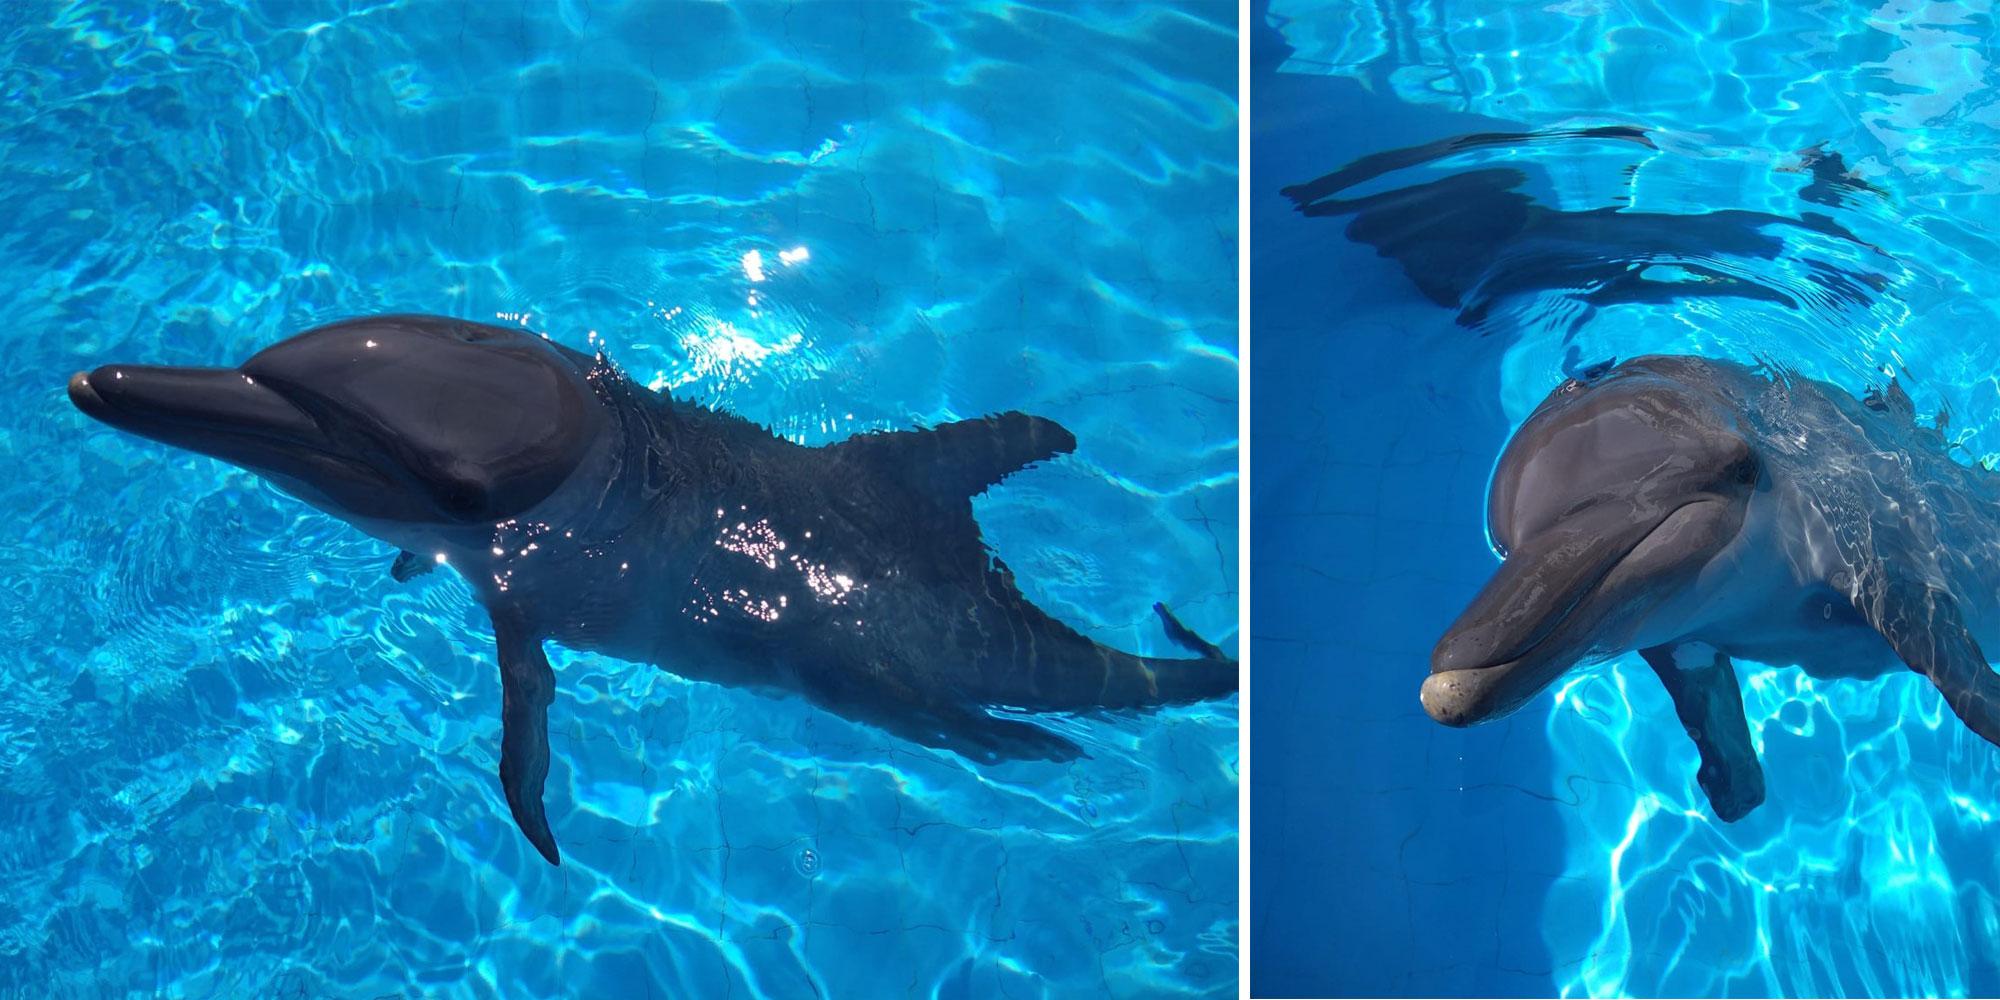 bali therapy dolphin simba